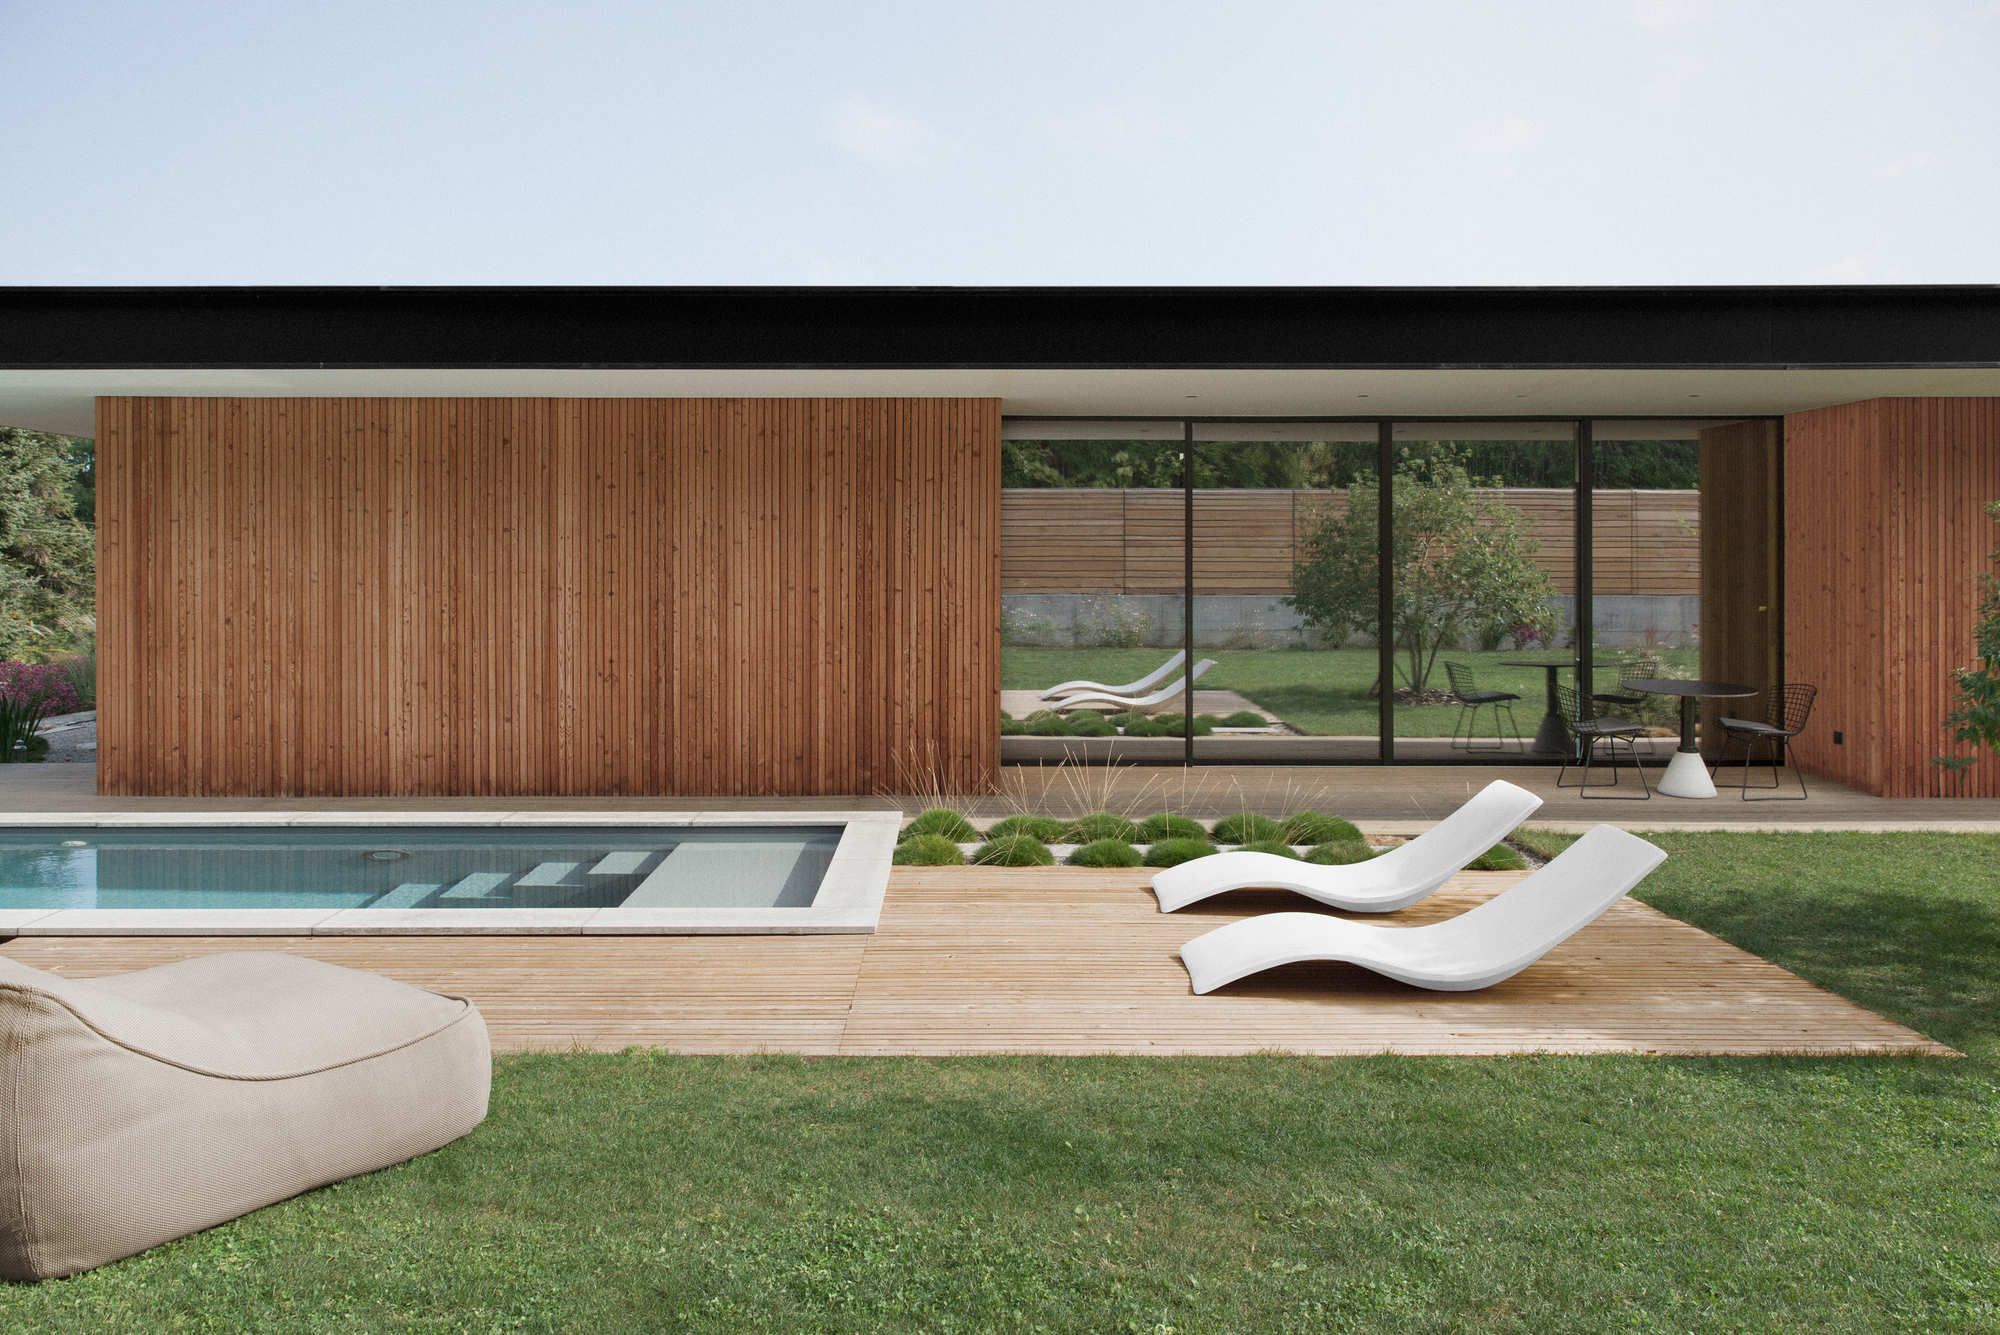 galer a de la maison etir e barres coquet 1. Black Bedroom Furniture Sets. Home Design Ideas